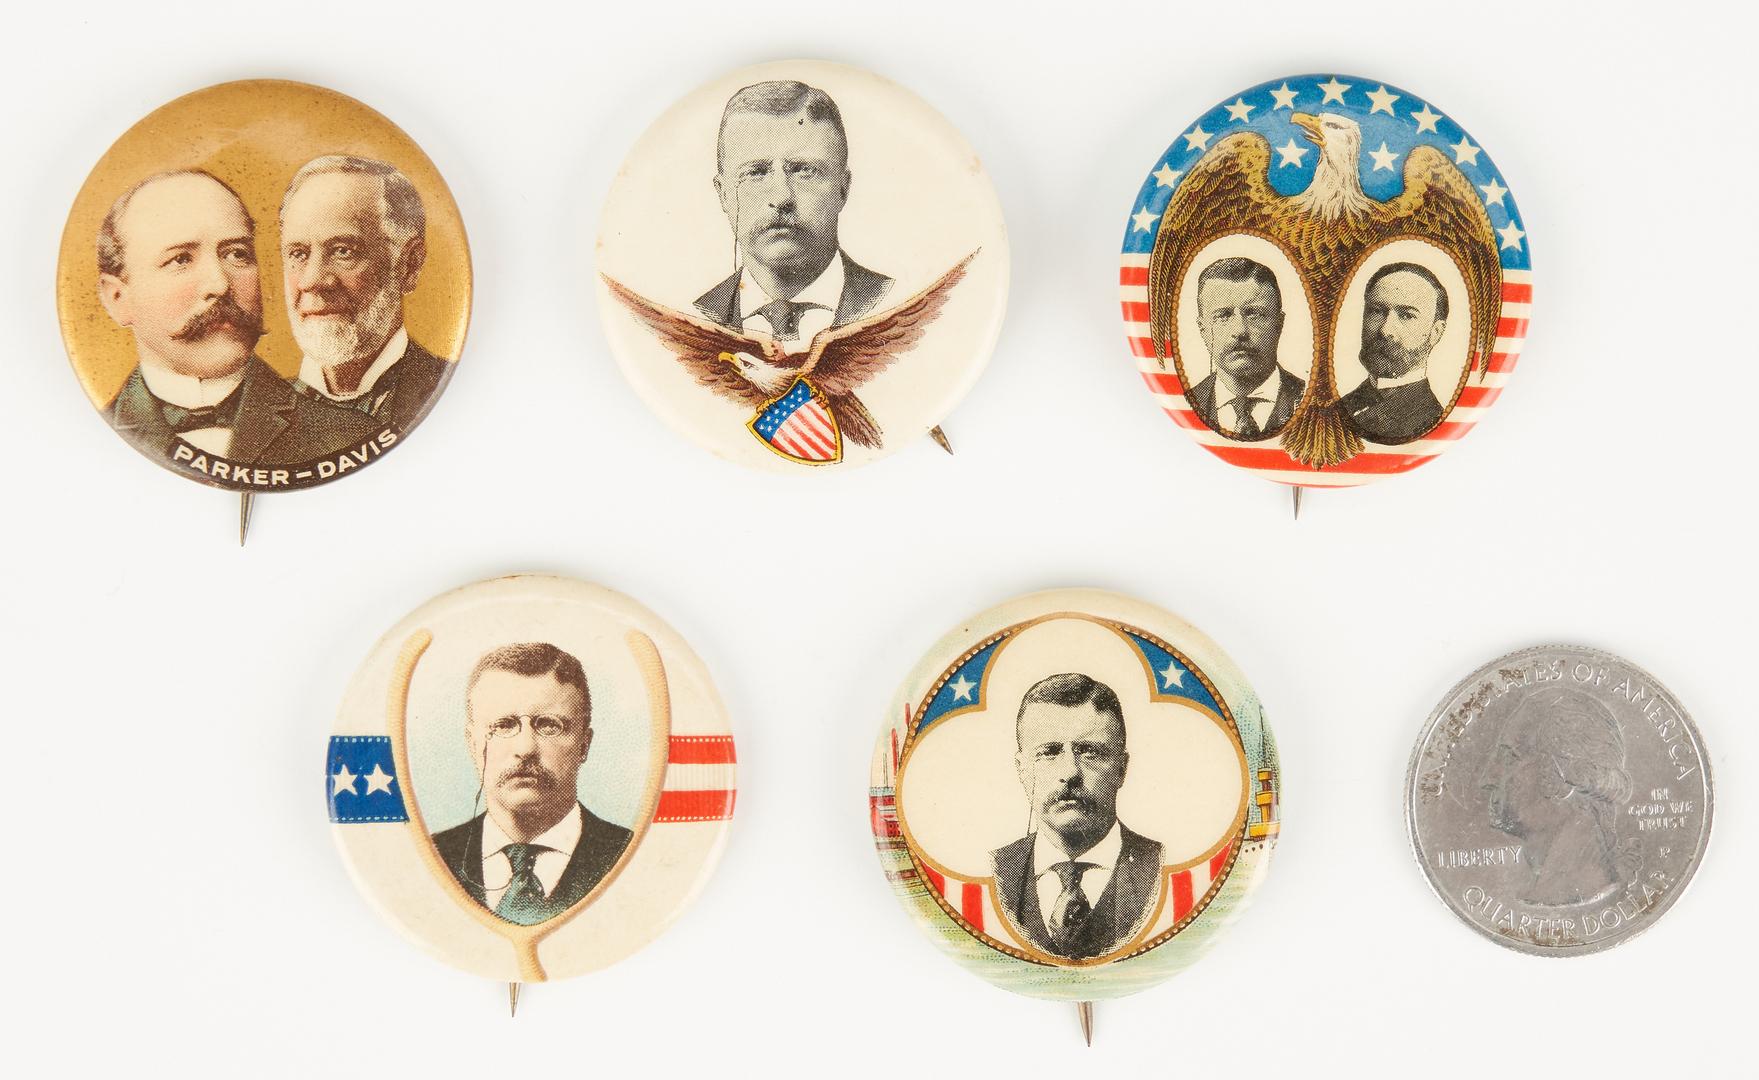 Lot 1023: 5 Political Buttons, incl. Parker/Davis, T. Roosevelt